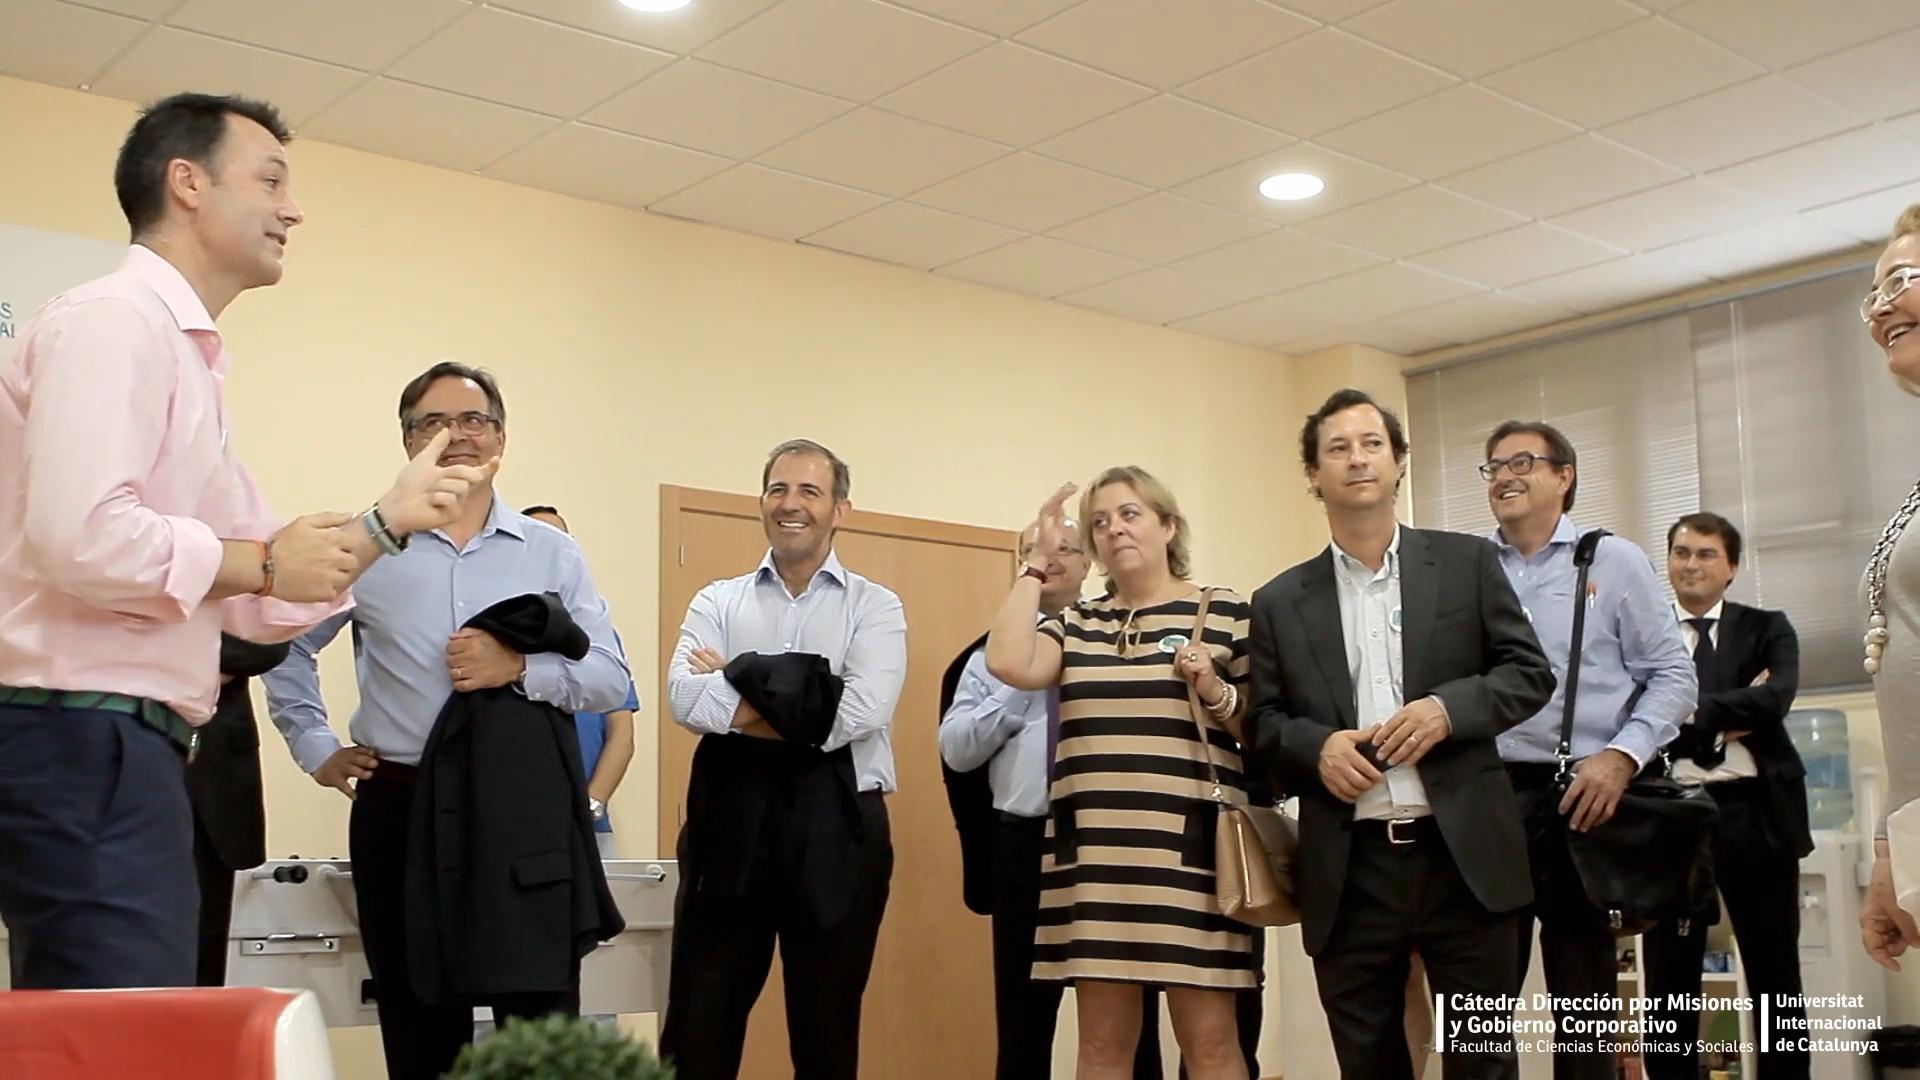 Vygon España Hosts The Vii Business Meeting Direccion Por